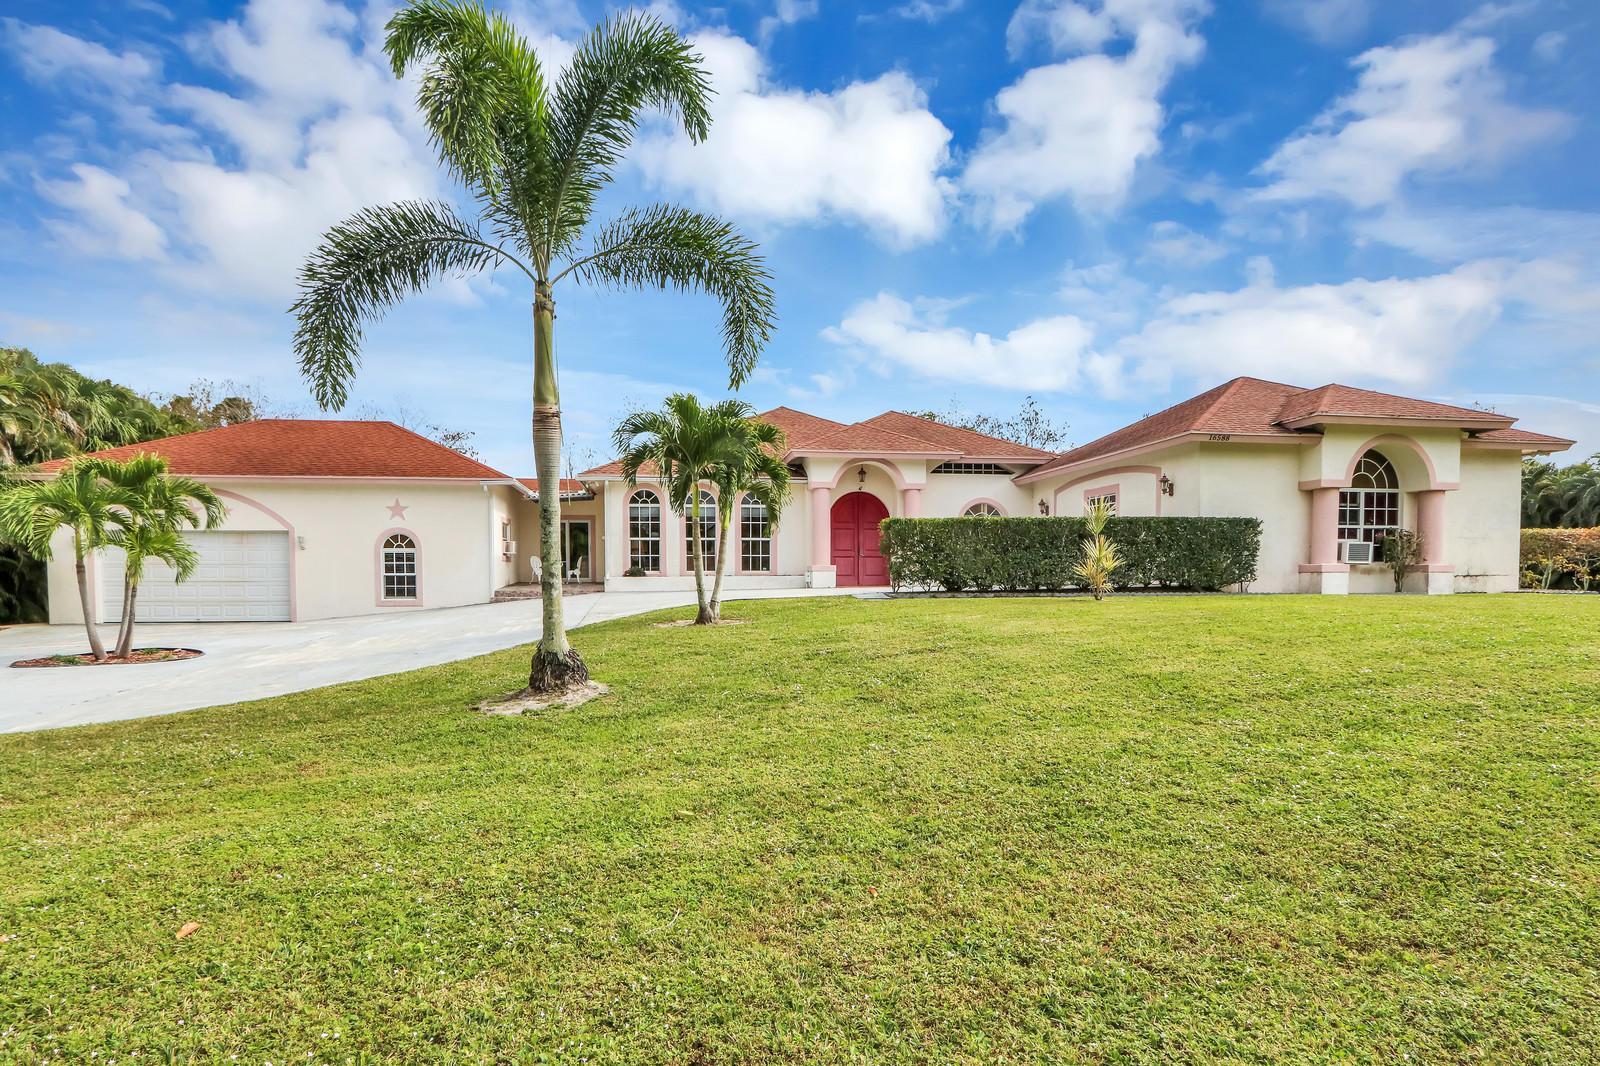 Details for 16588 78th Drive, West Palm Beach, FL 33418